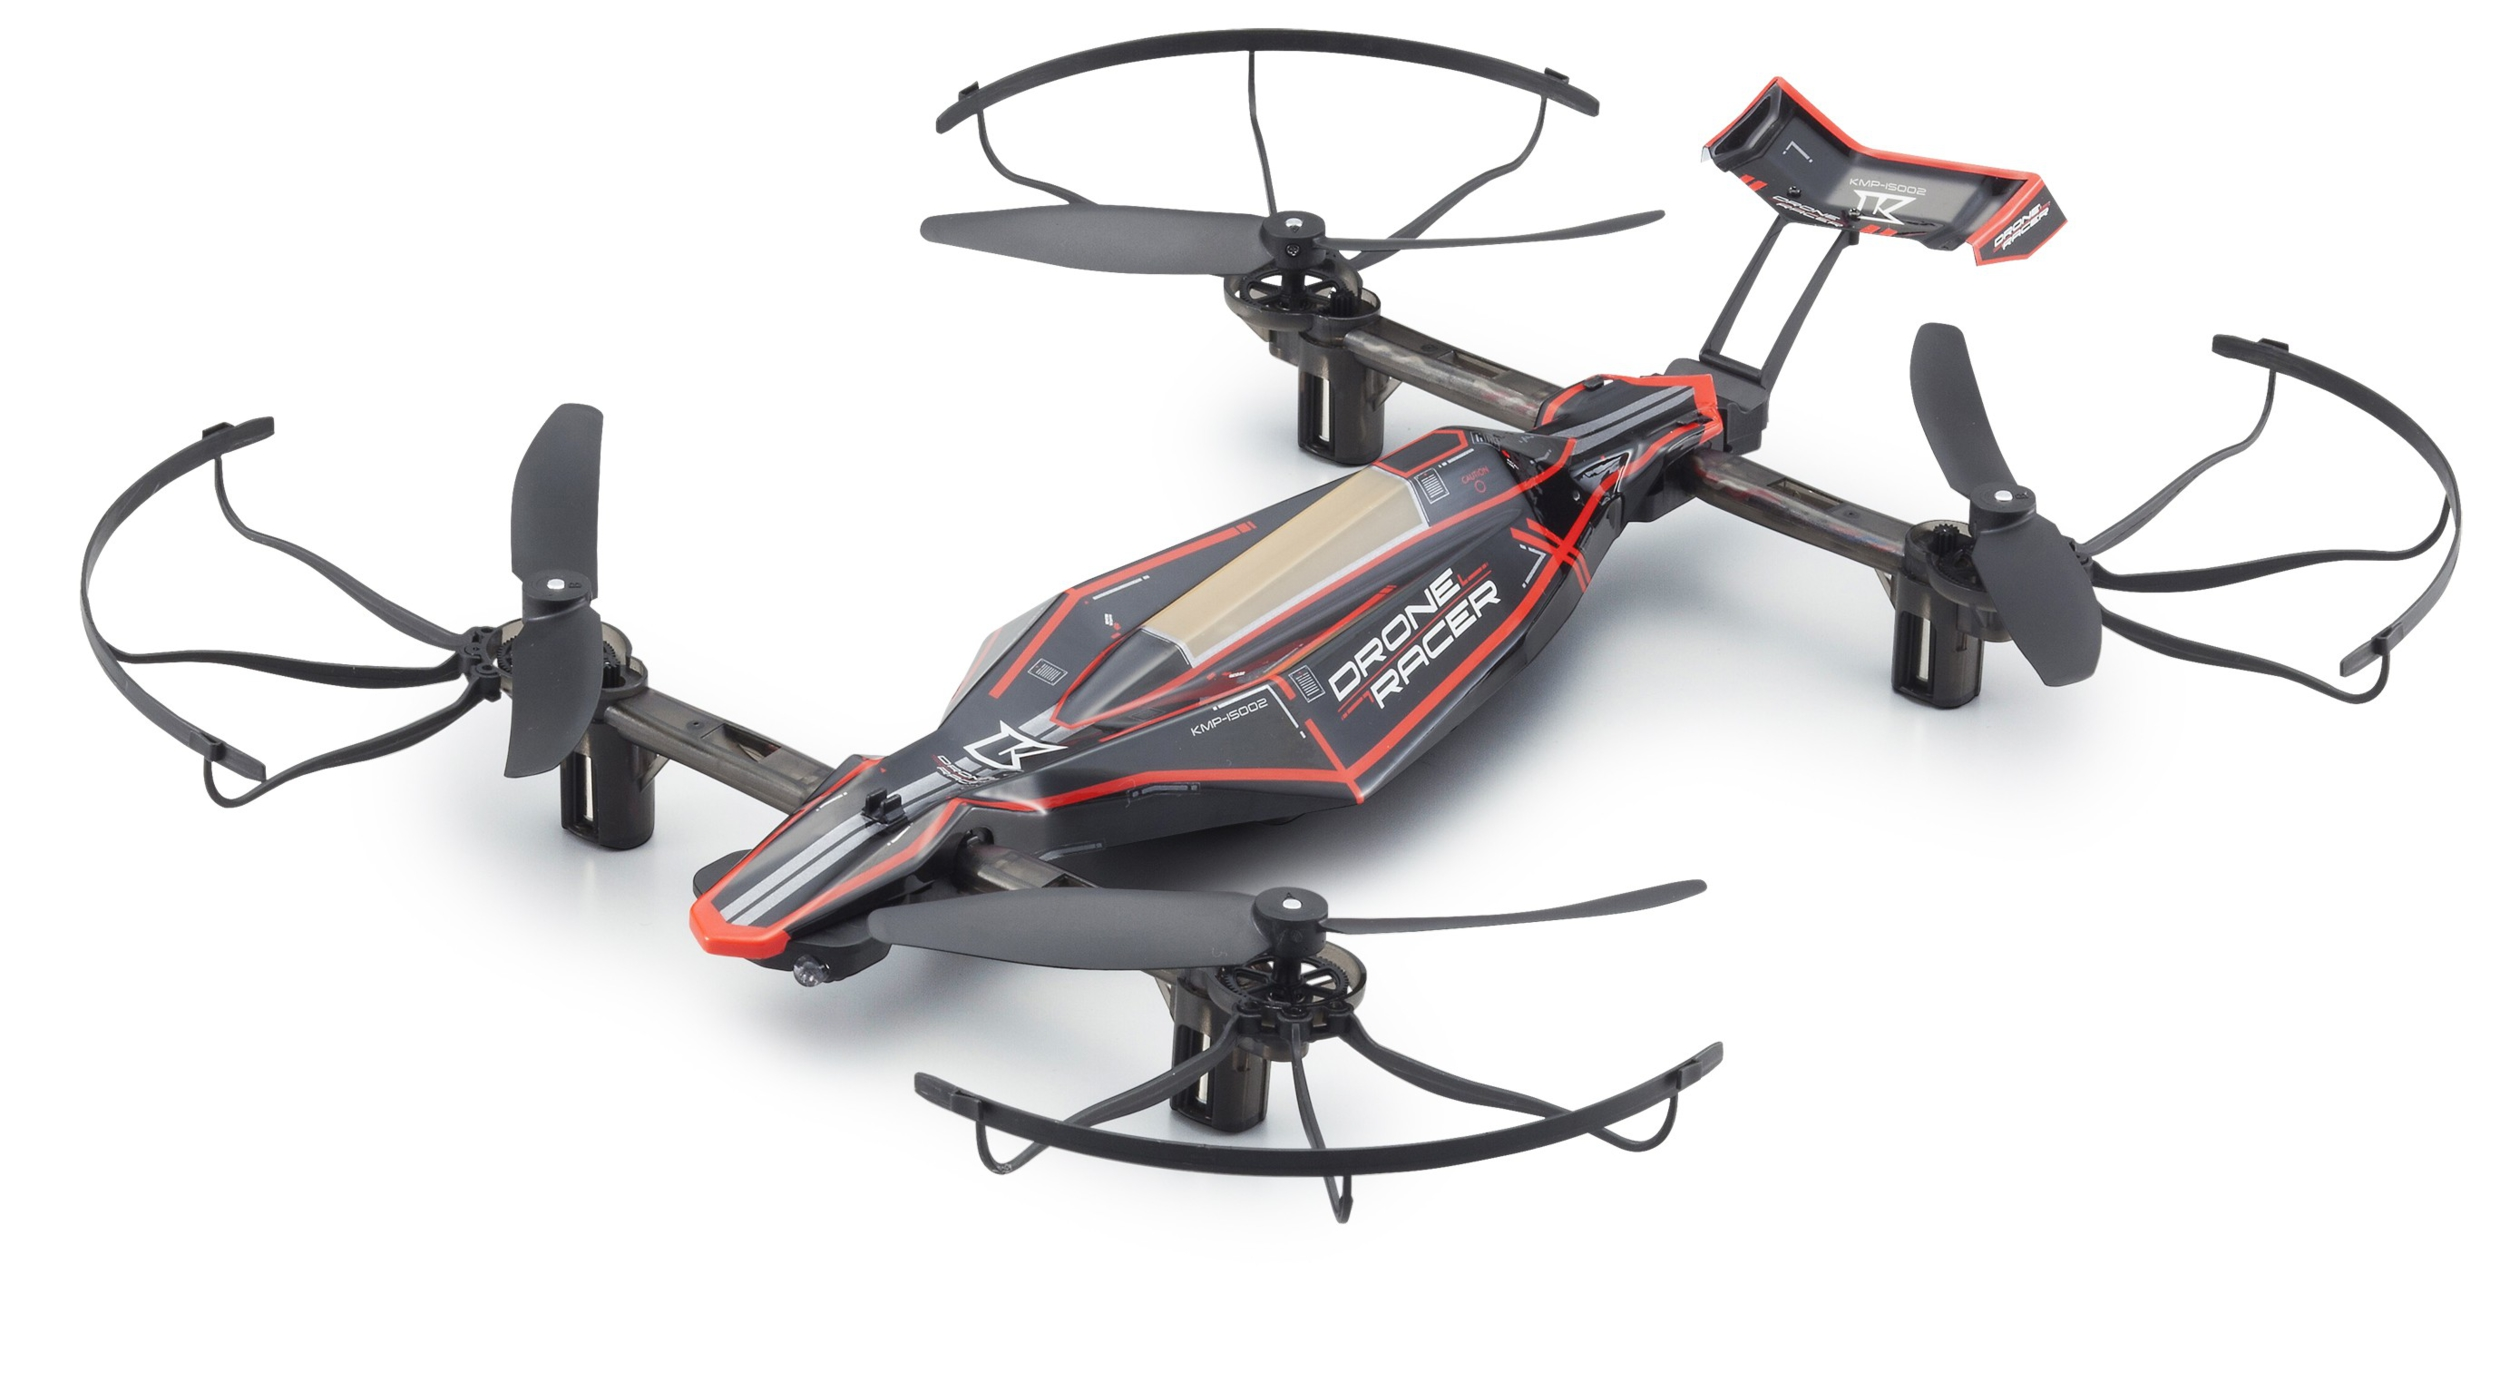 KYOSHO DRONE RACER ZEPHYR FORCE BLACK READYSET, 20572BK